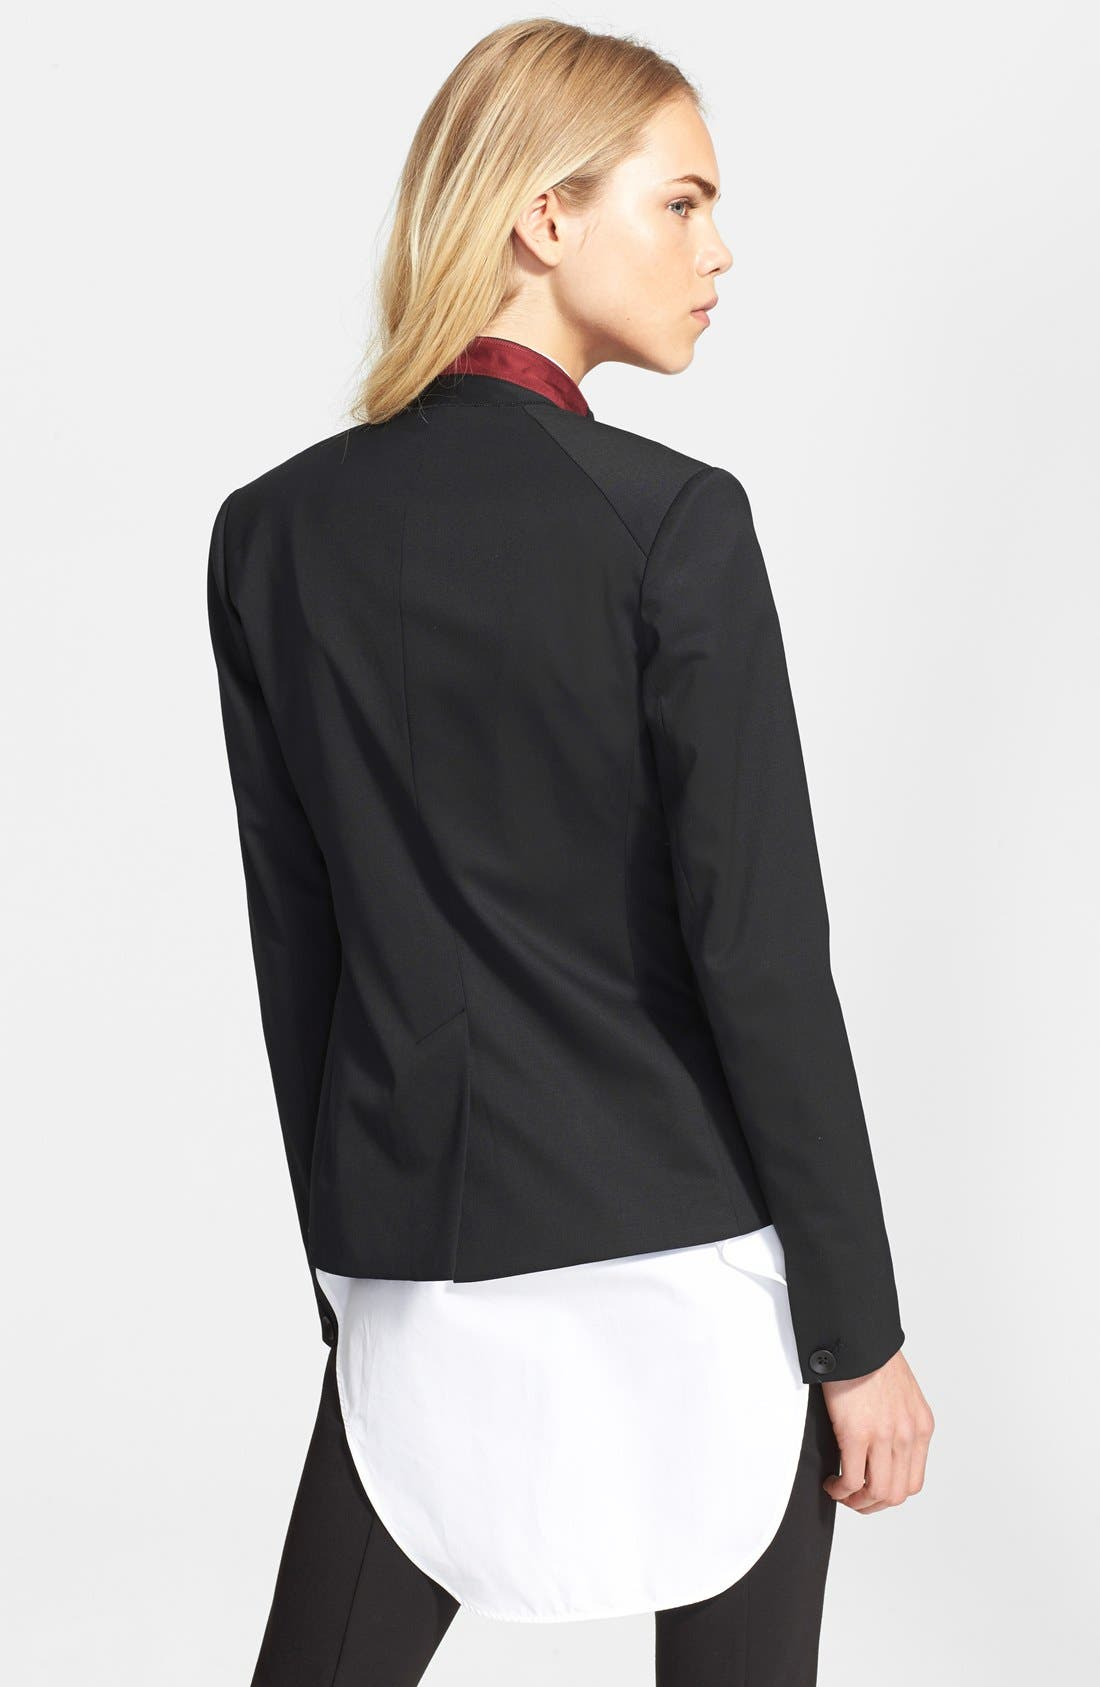 RAG & BONE,                             'Archer' One-Button Wool Blend Blazer,                             Alternate thumbnail 2, color,                             001